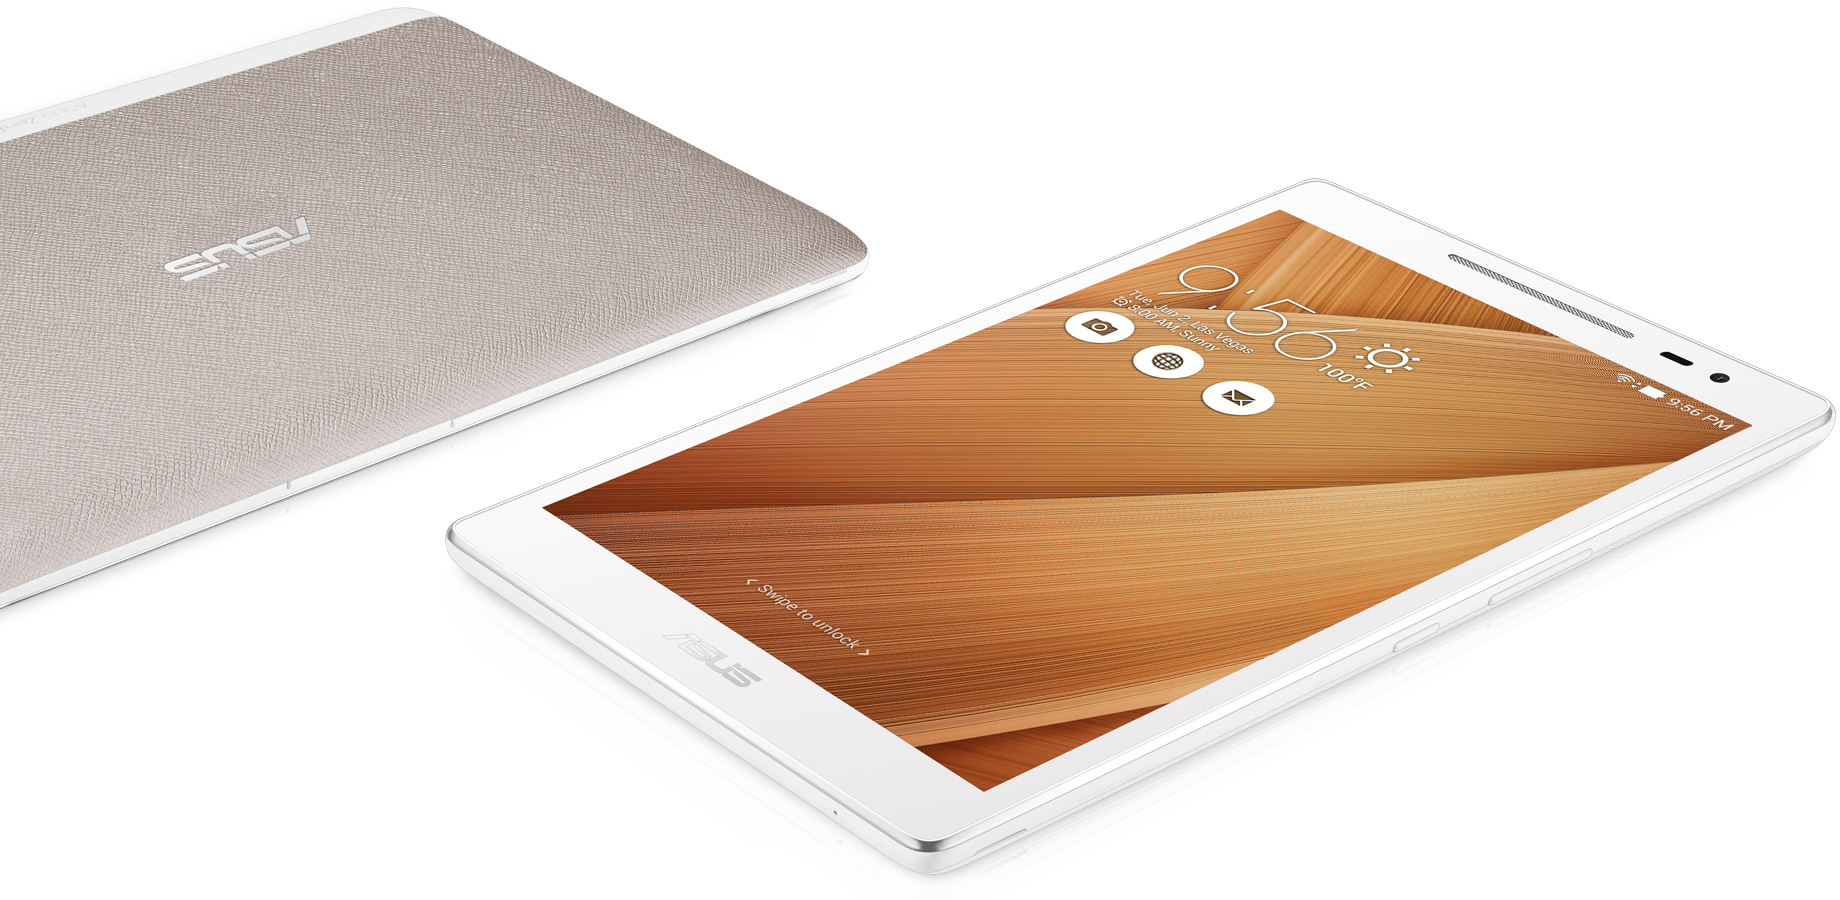 ASUS ZenPad 8.0 (Z380M)   Tablets   ASUS Global